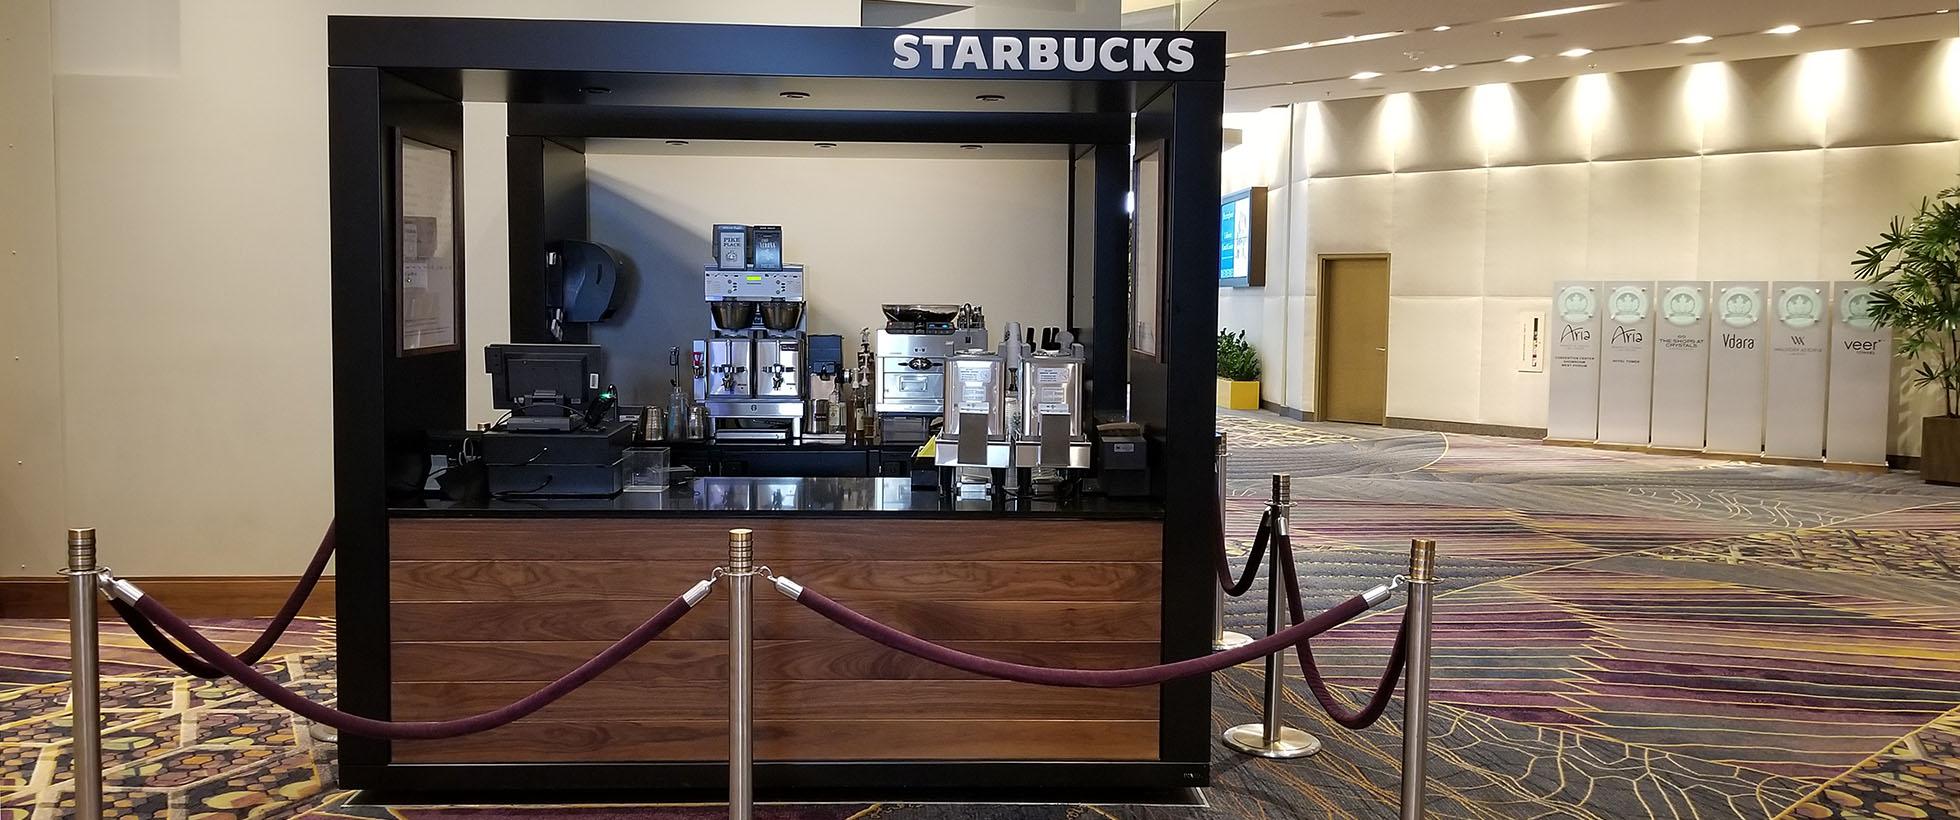 Starbucks Pop Up Cart Store